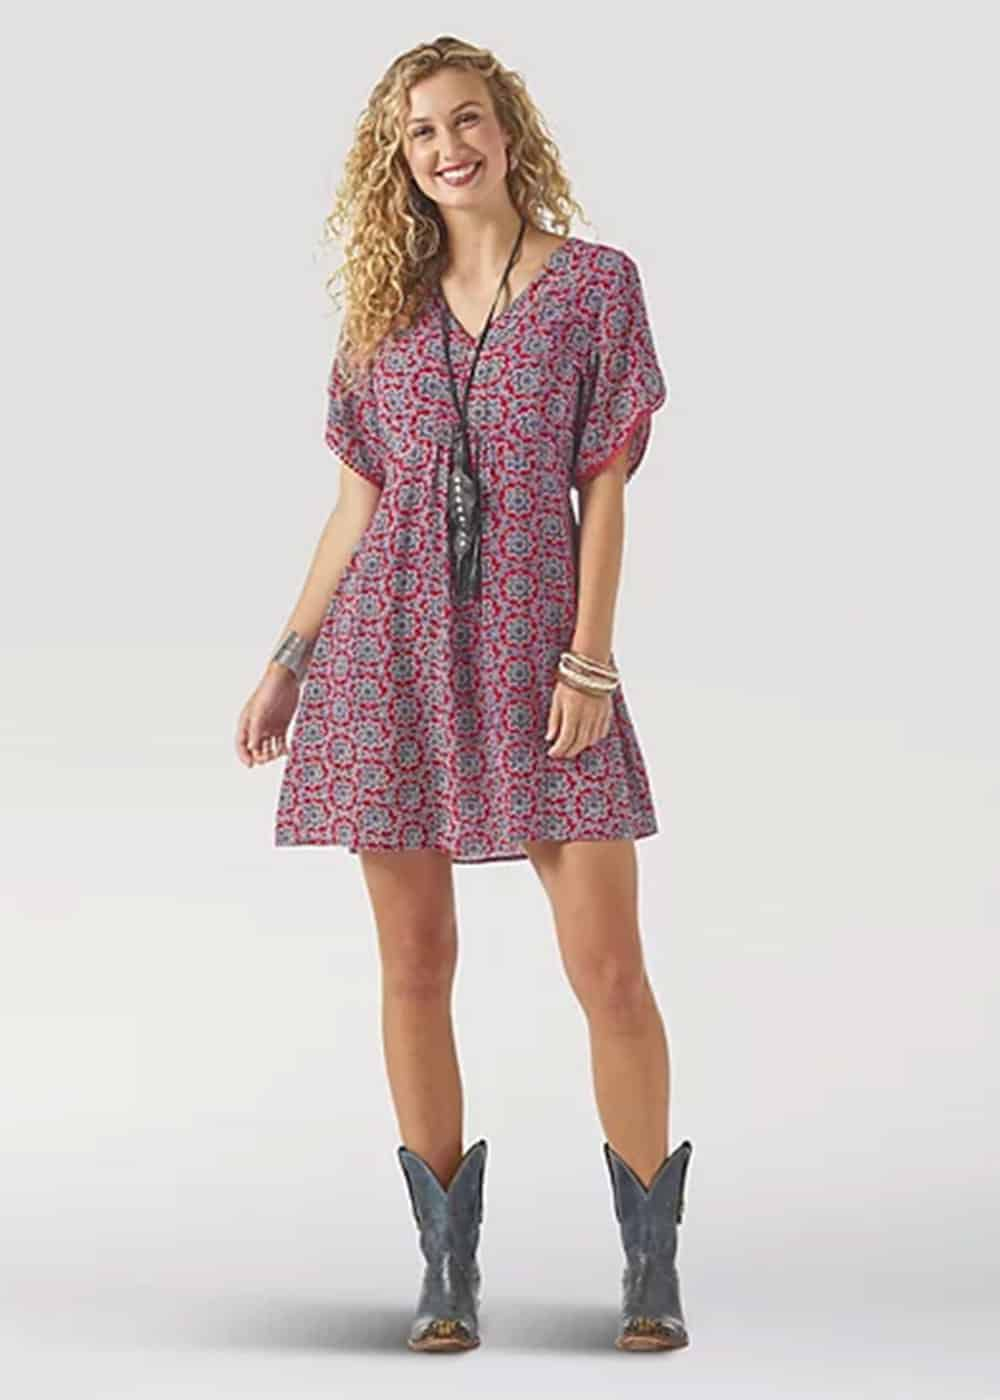 summer-ready styles wrangler cowgirl magazine